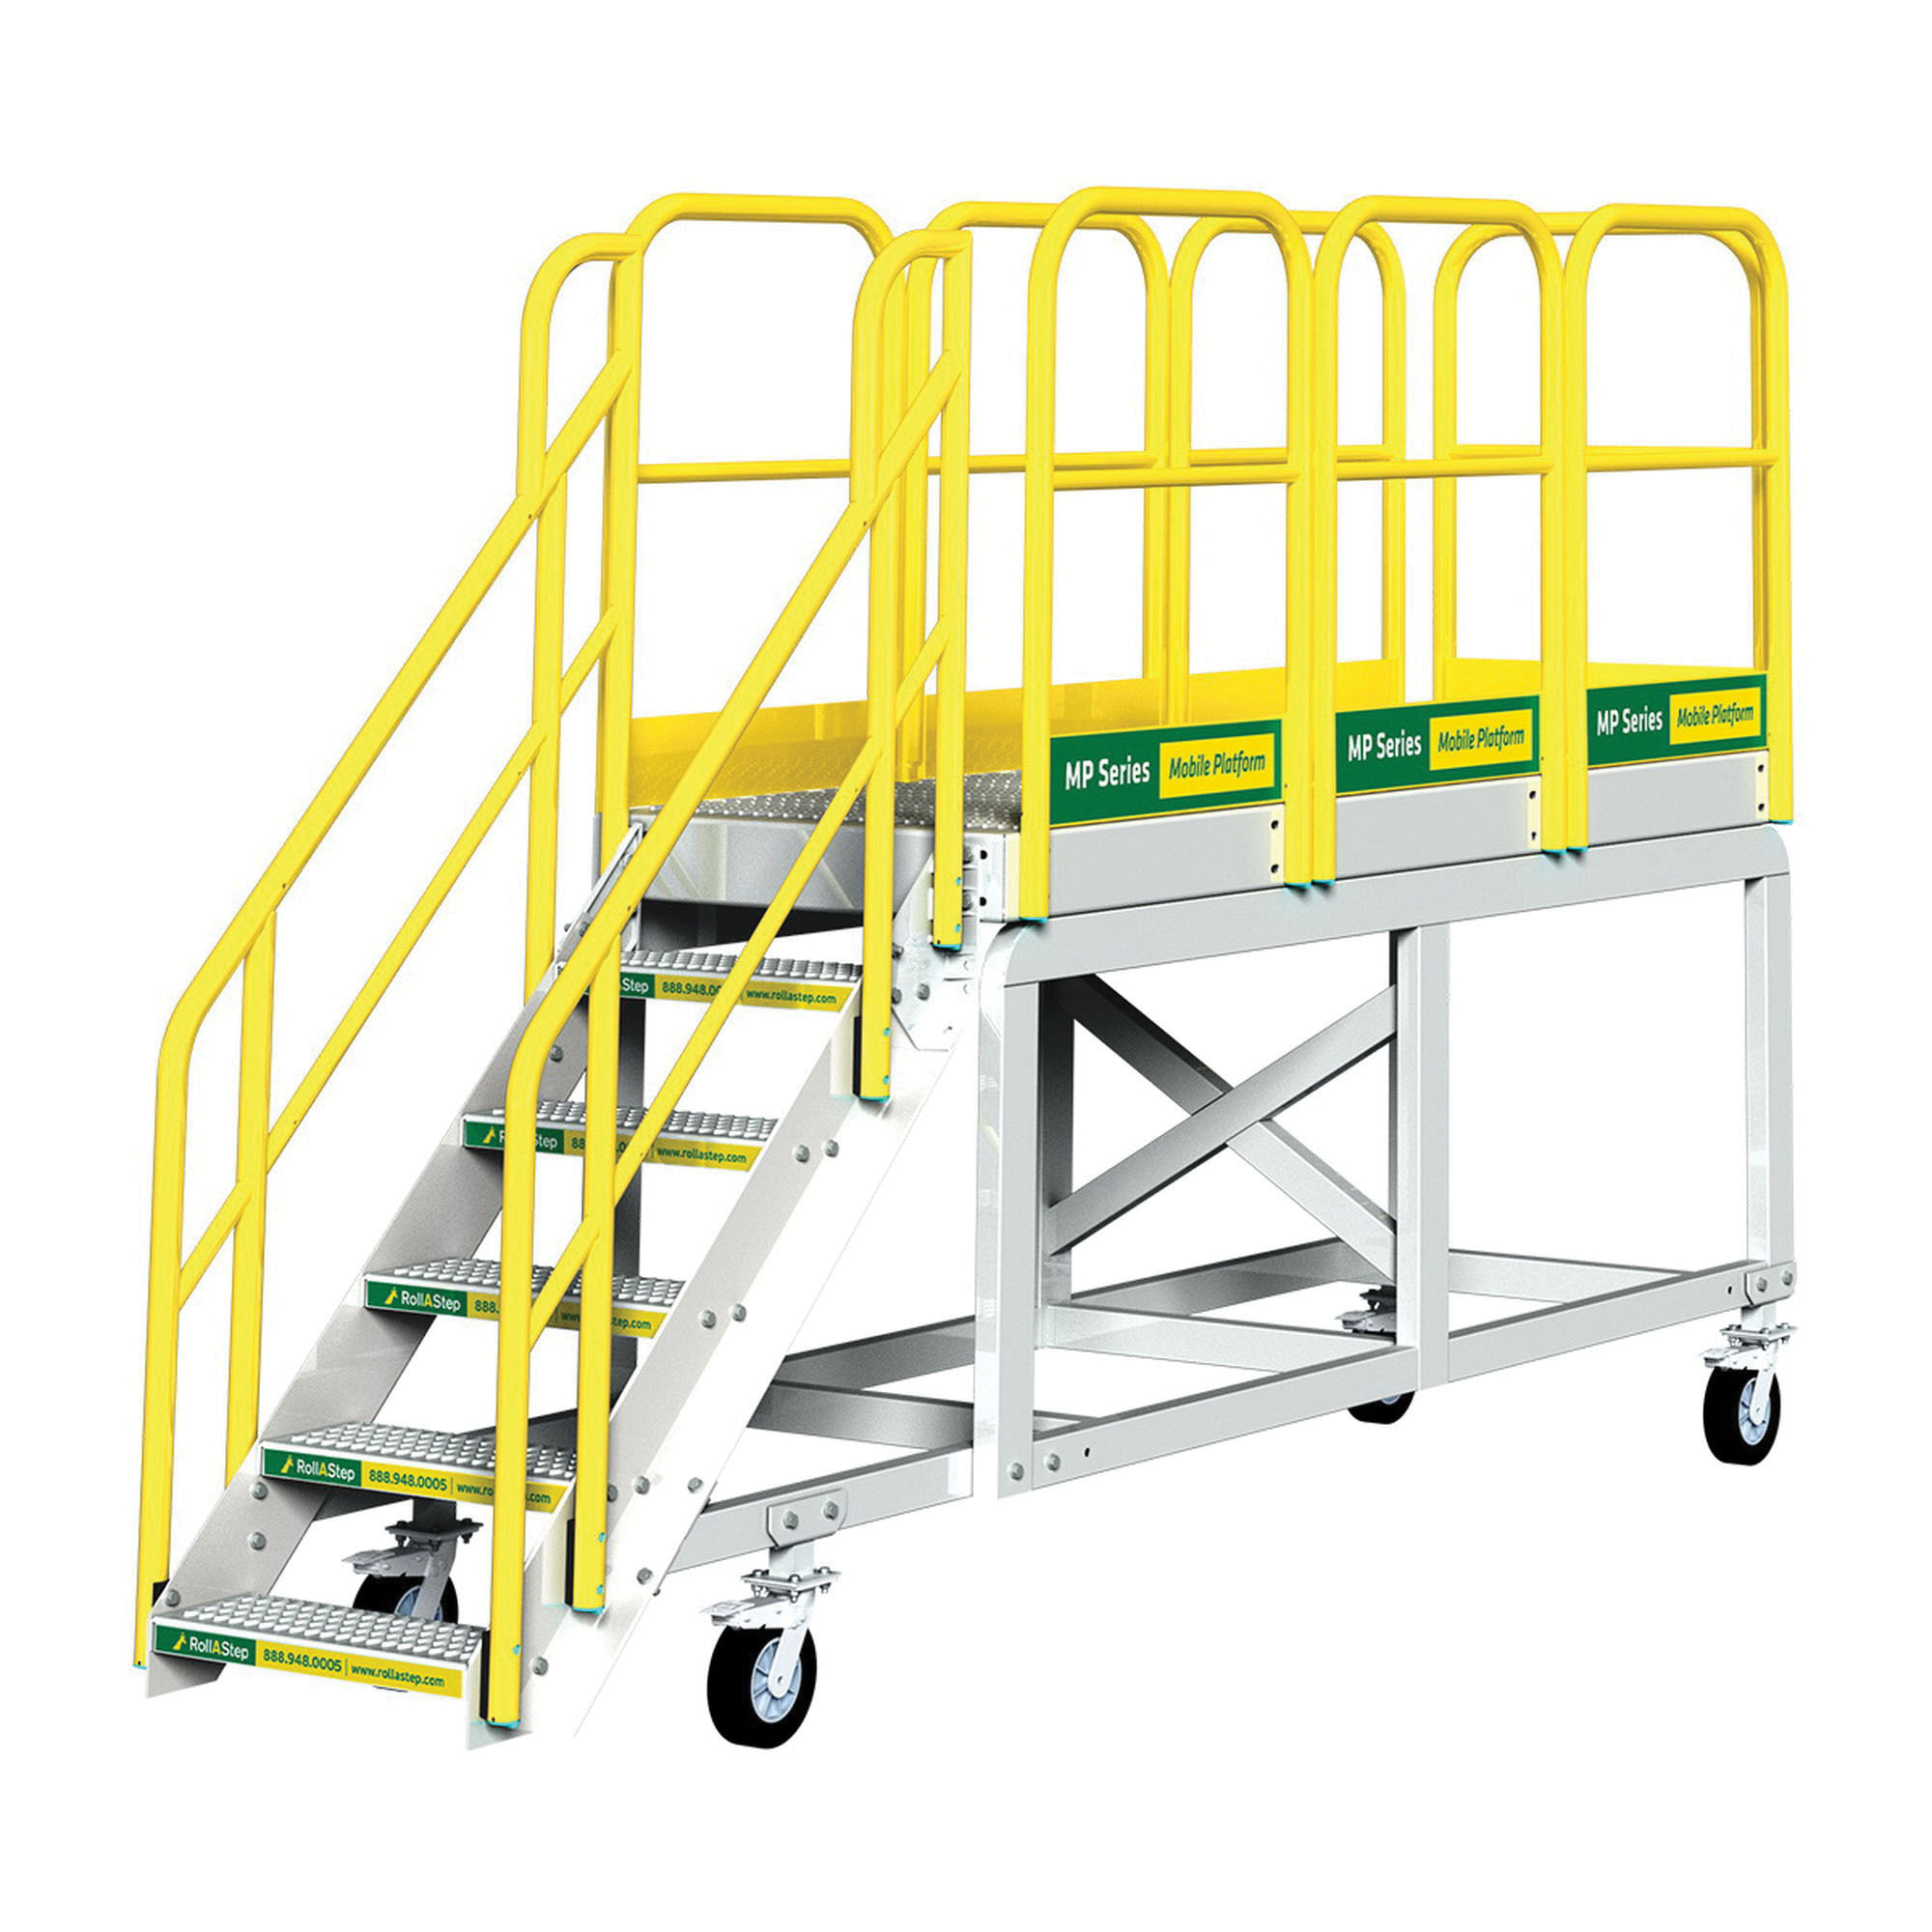 Rollastep® 11786 Aluminum Mobile Work Platform, 27 in H, 2 Step, 104 in L x 36 in W Platform